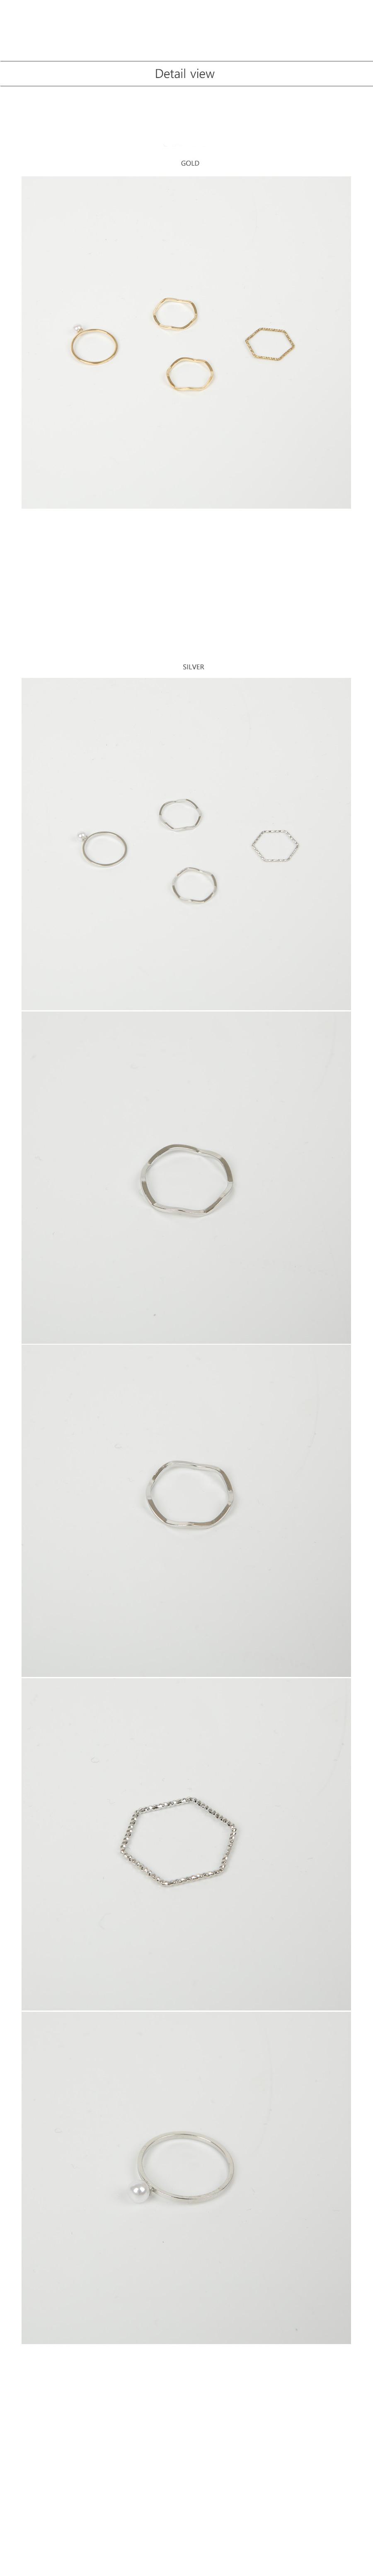 Friends Ring Set